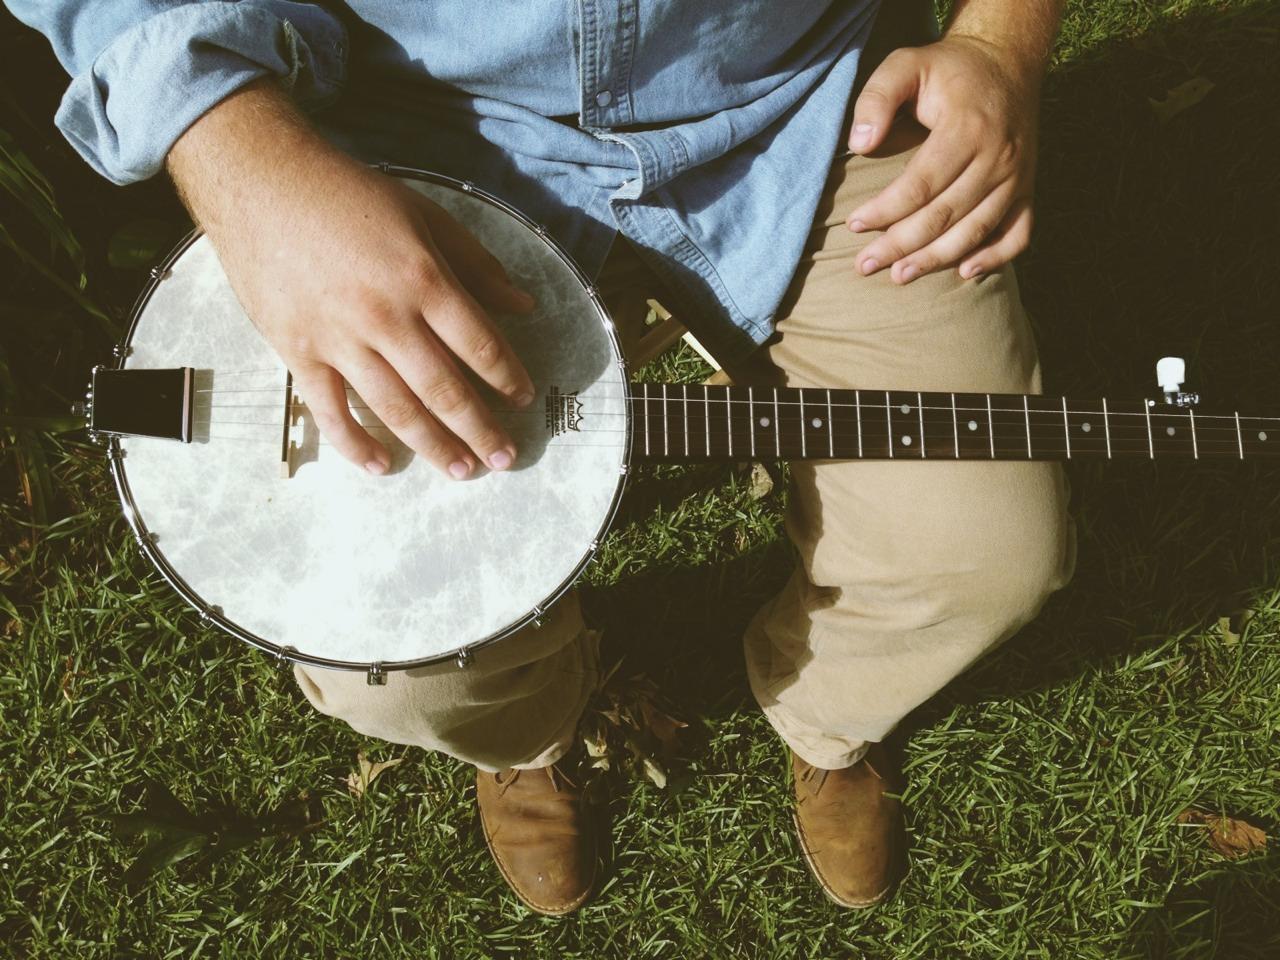 banjo-folk-singer